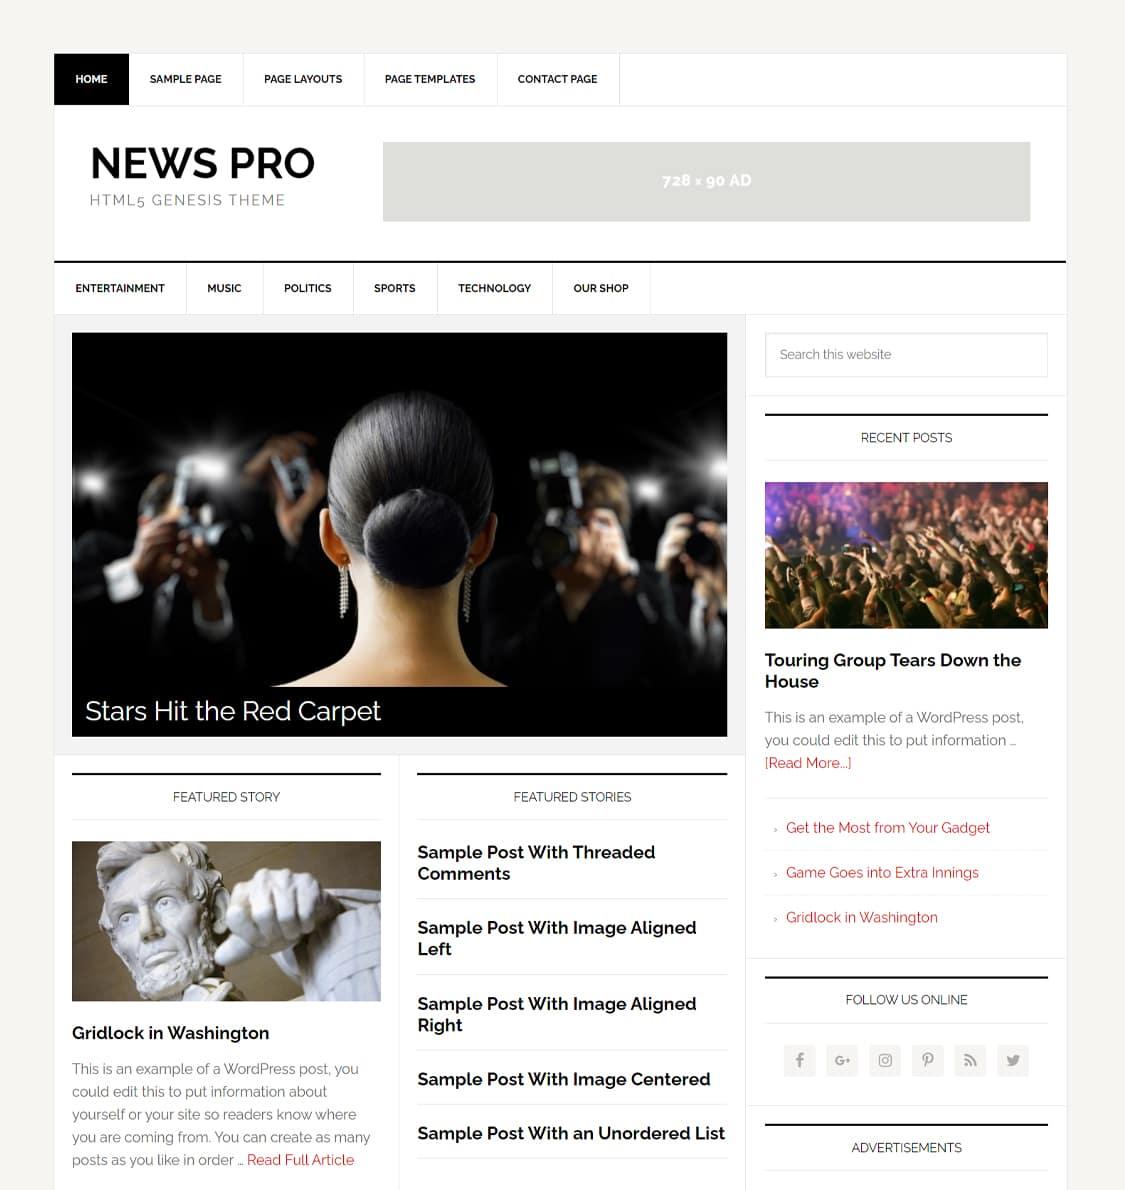 News Pro theme demo